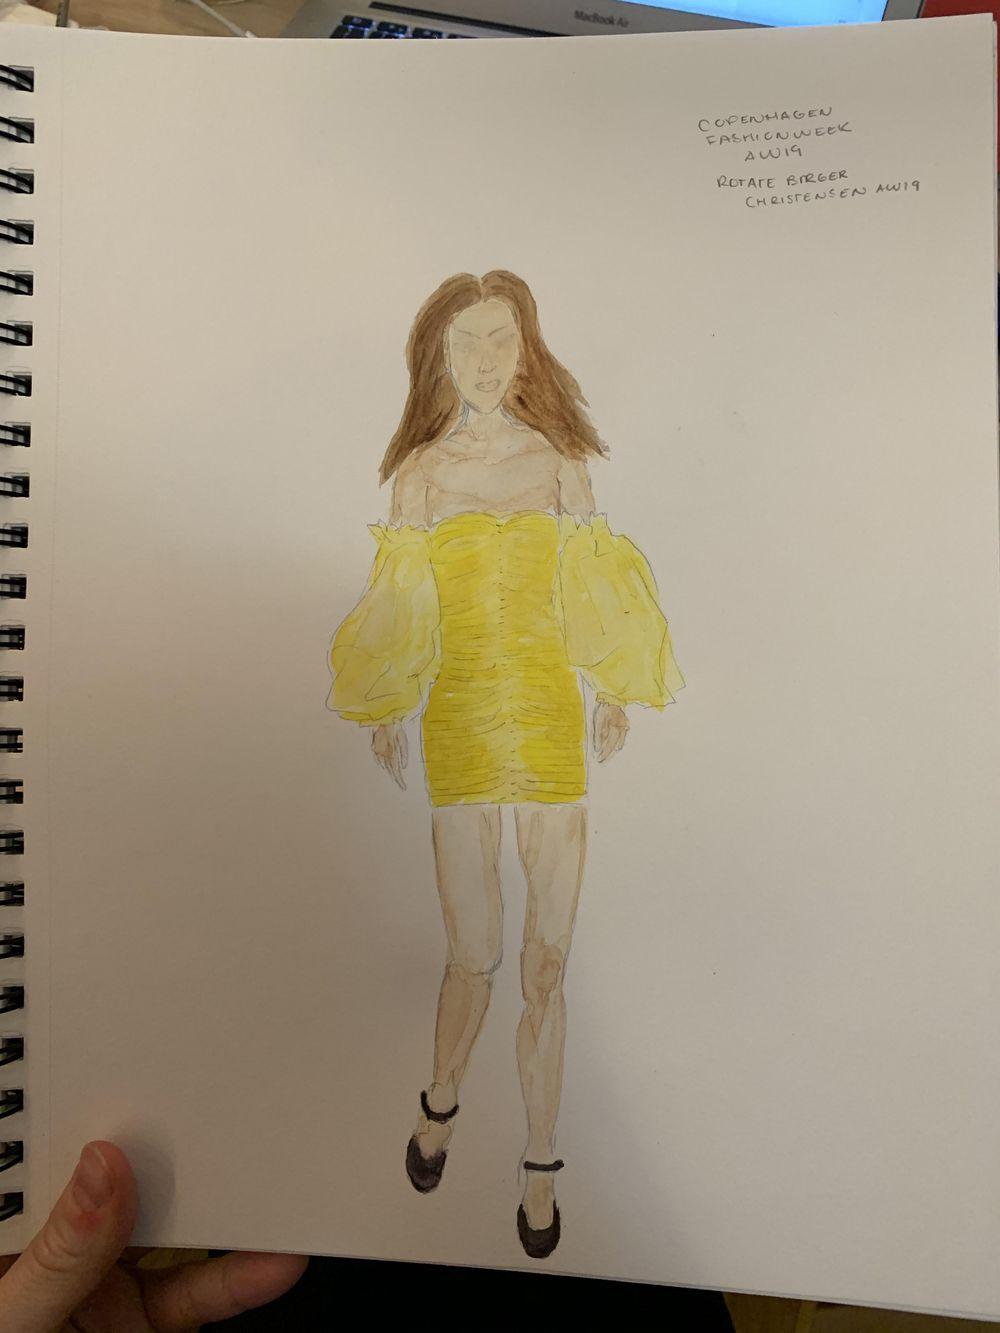 Copenhagen Fashion week AW19 - image 1 - student project